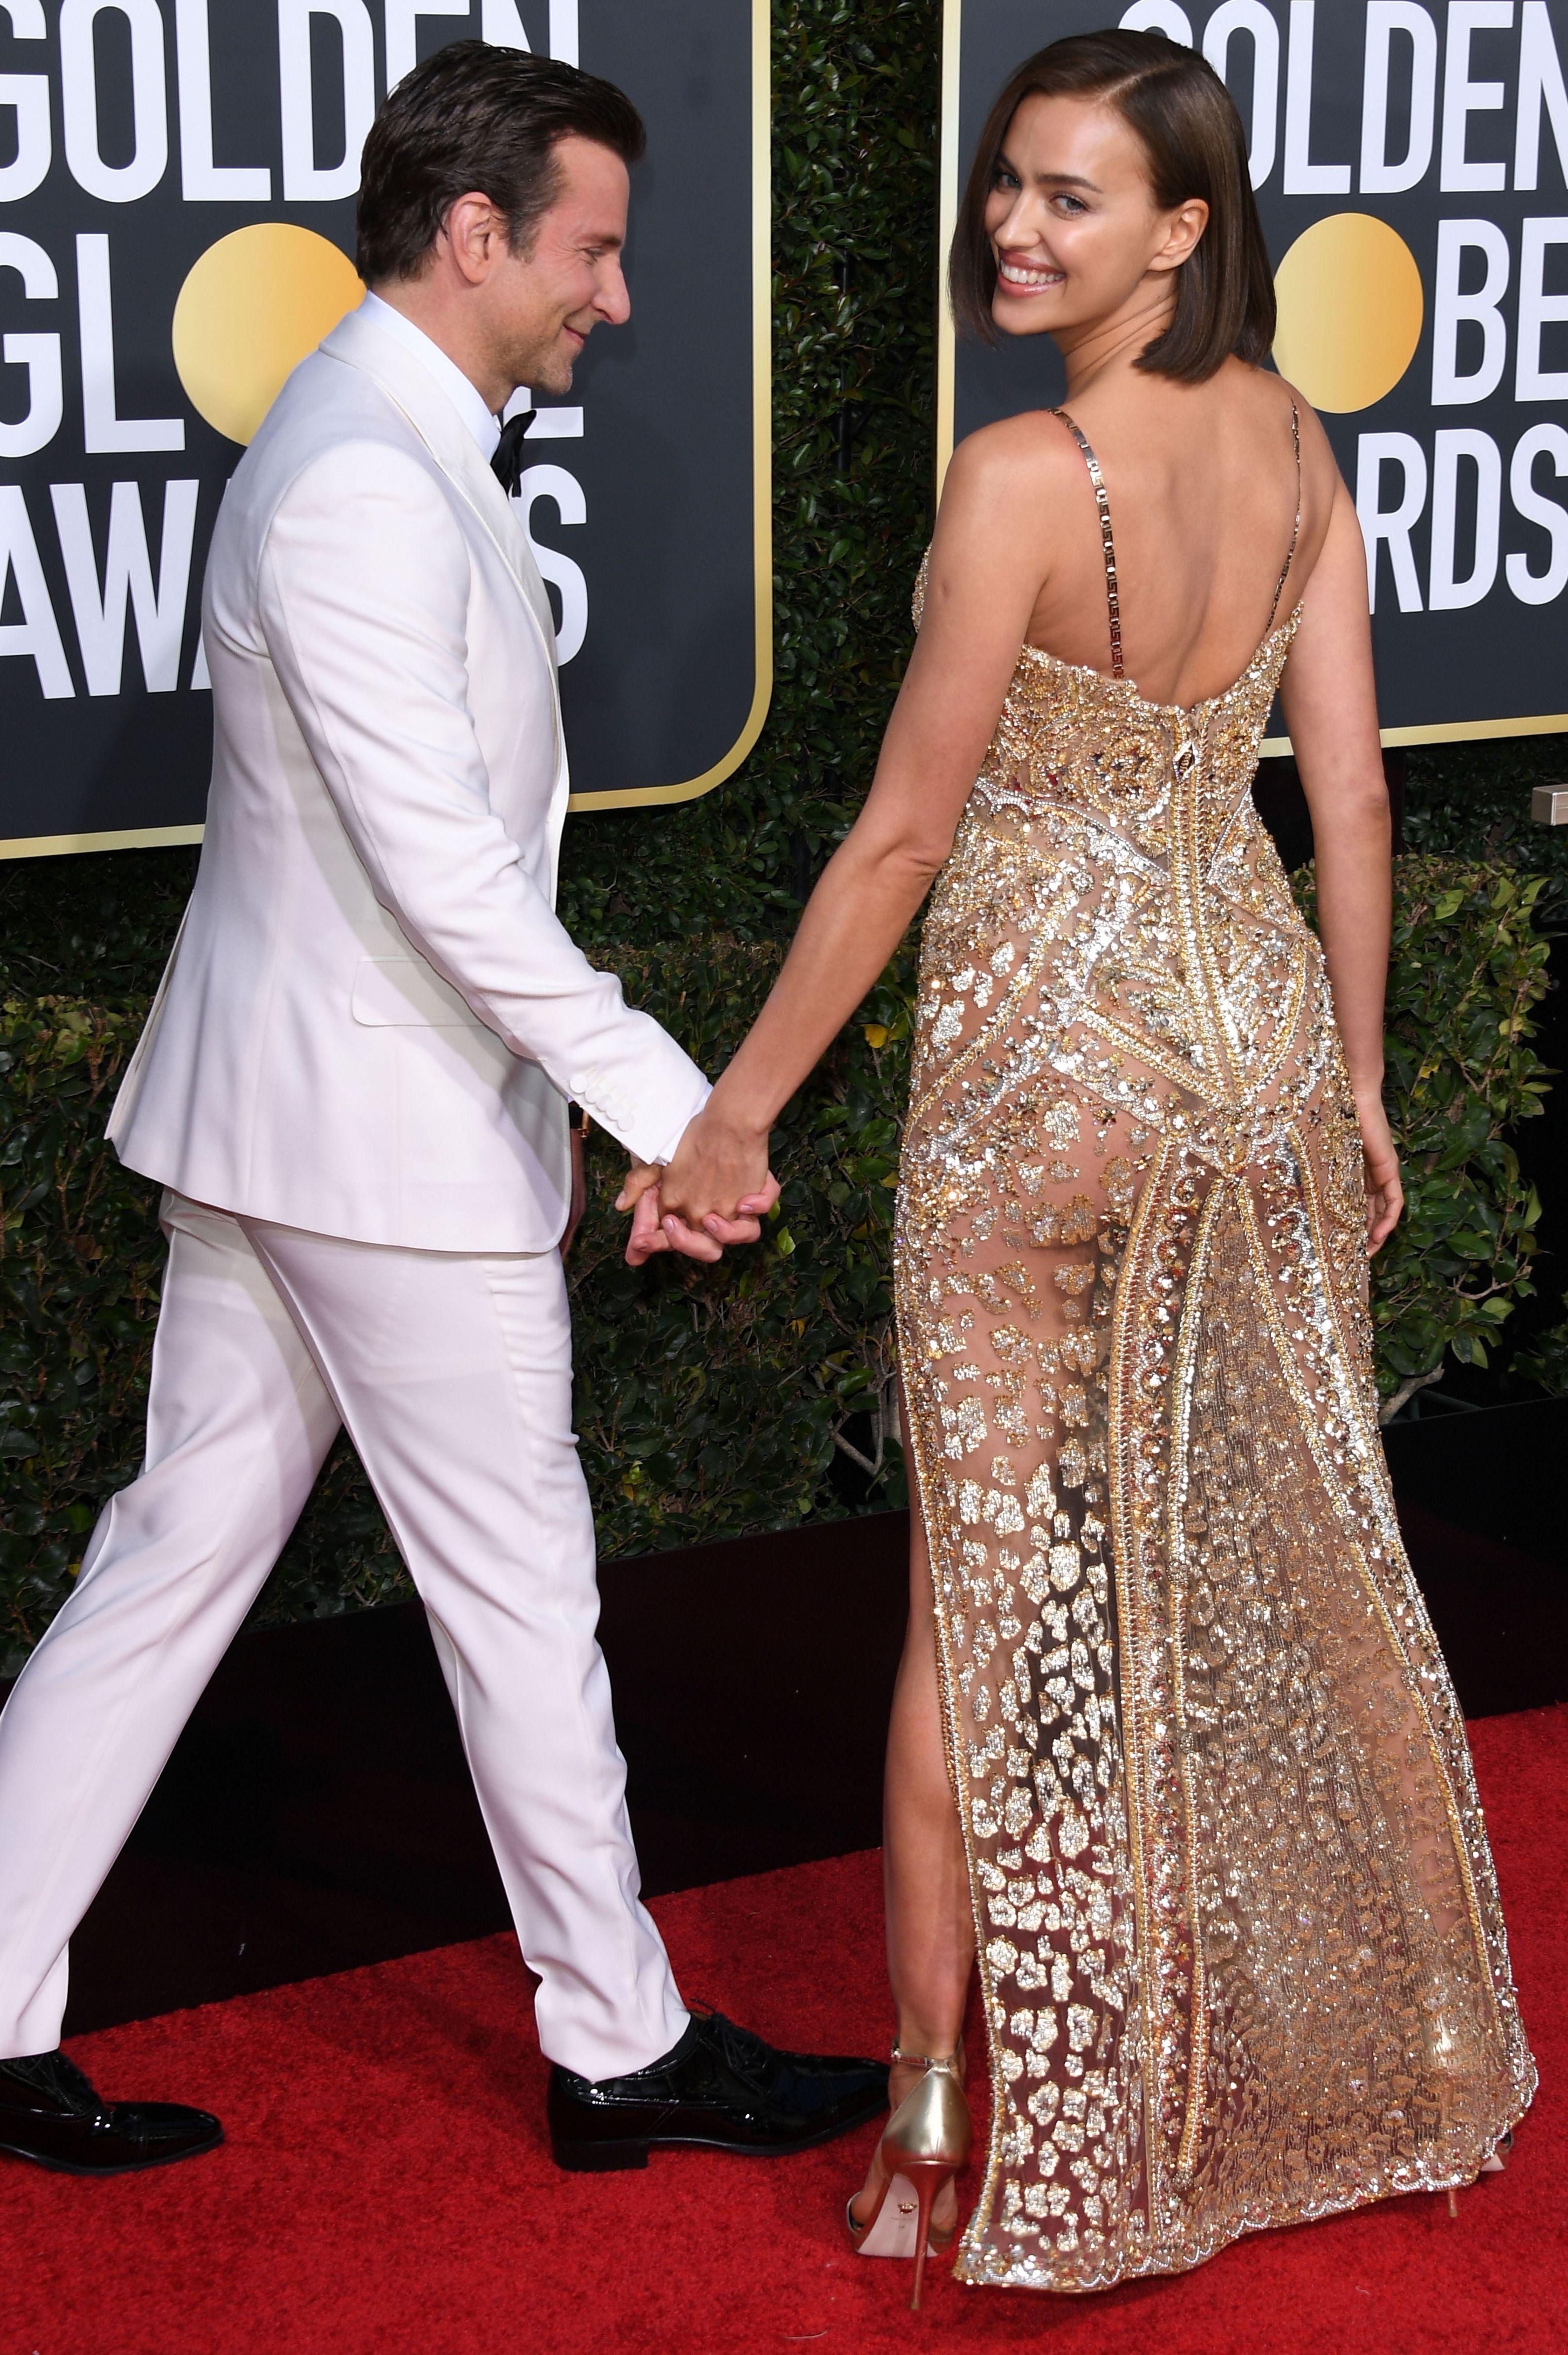 Golden Globes daring naked dresses